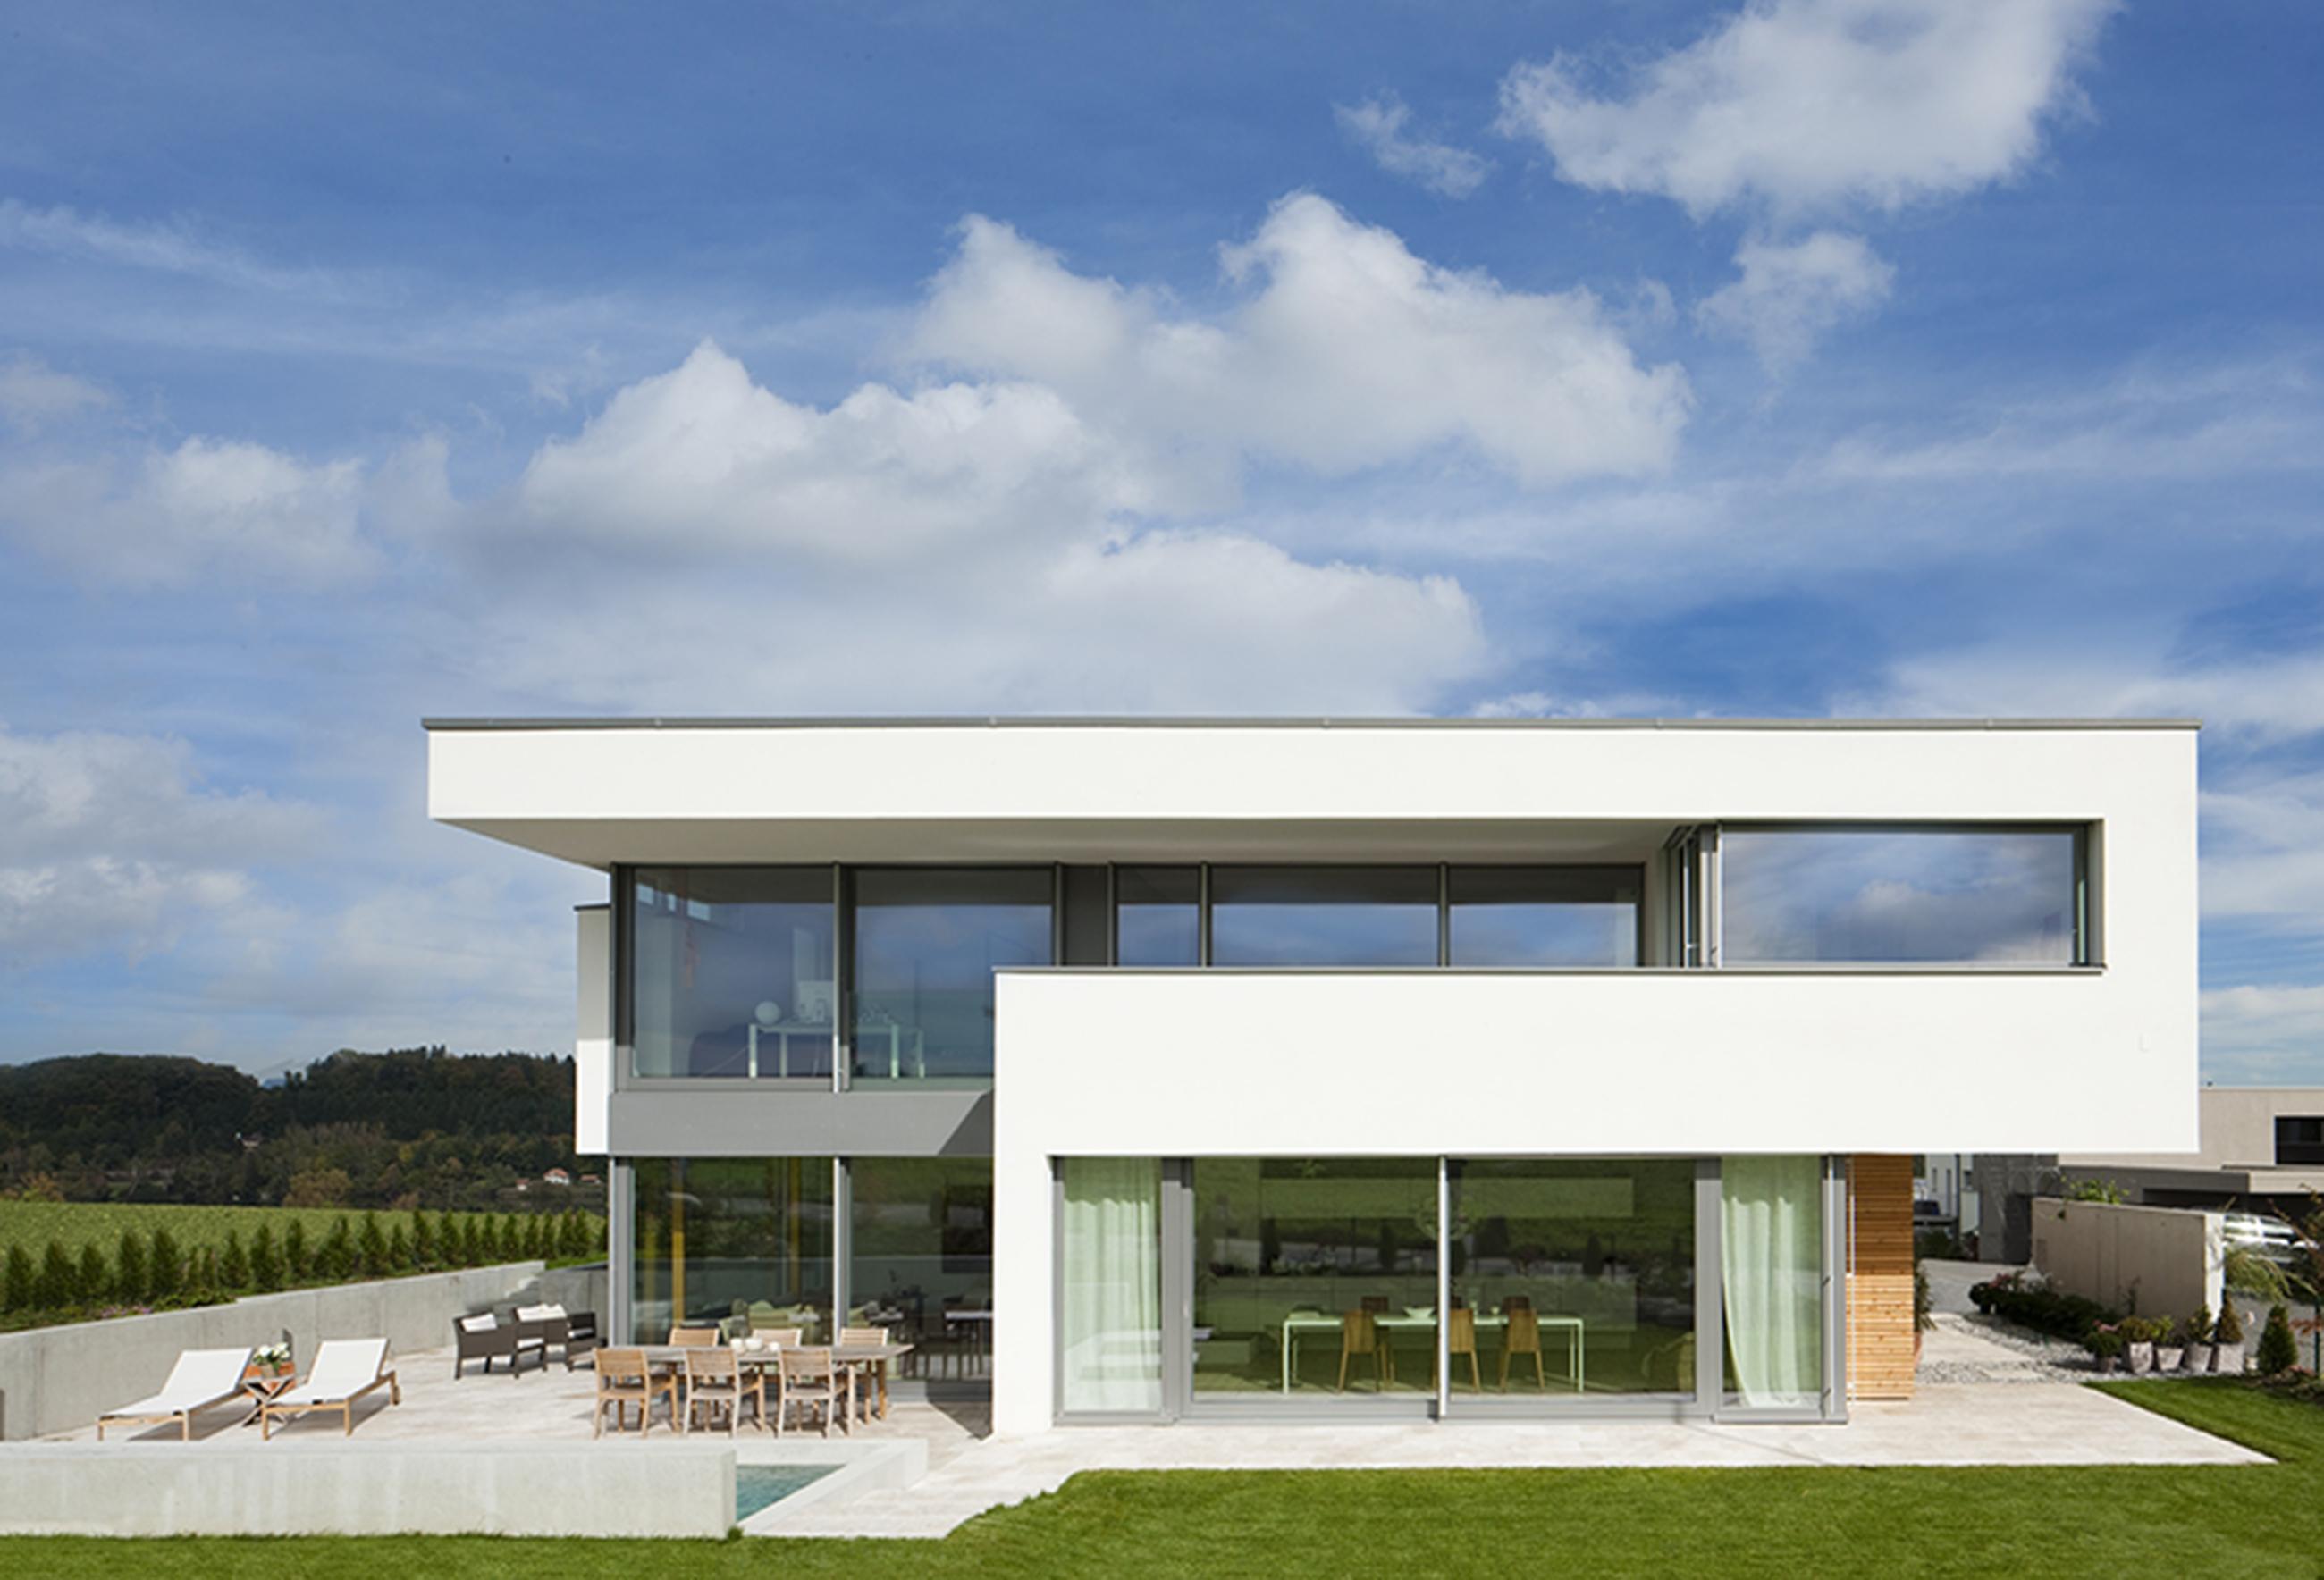 Fuchs, Wacker. Architekten Bda